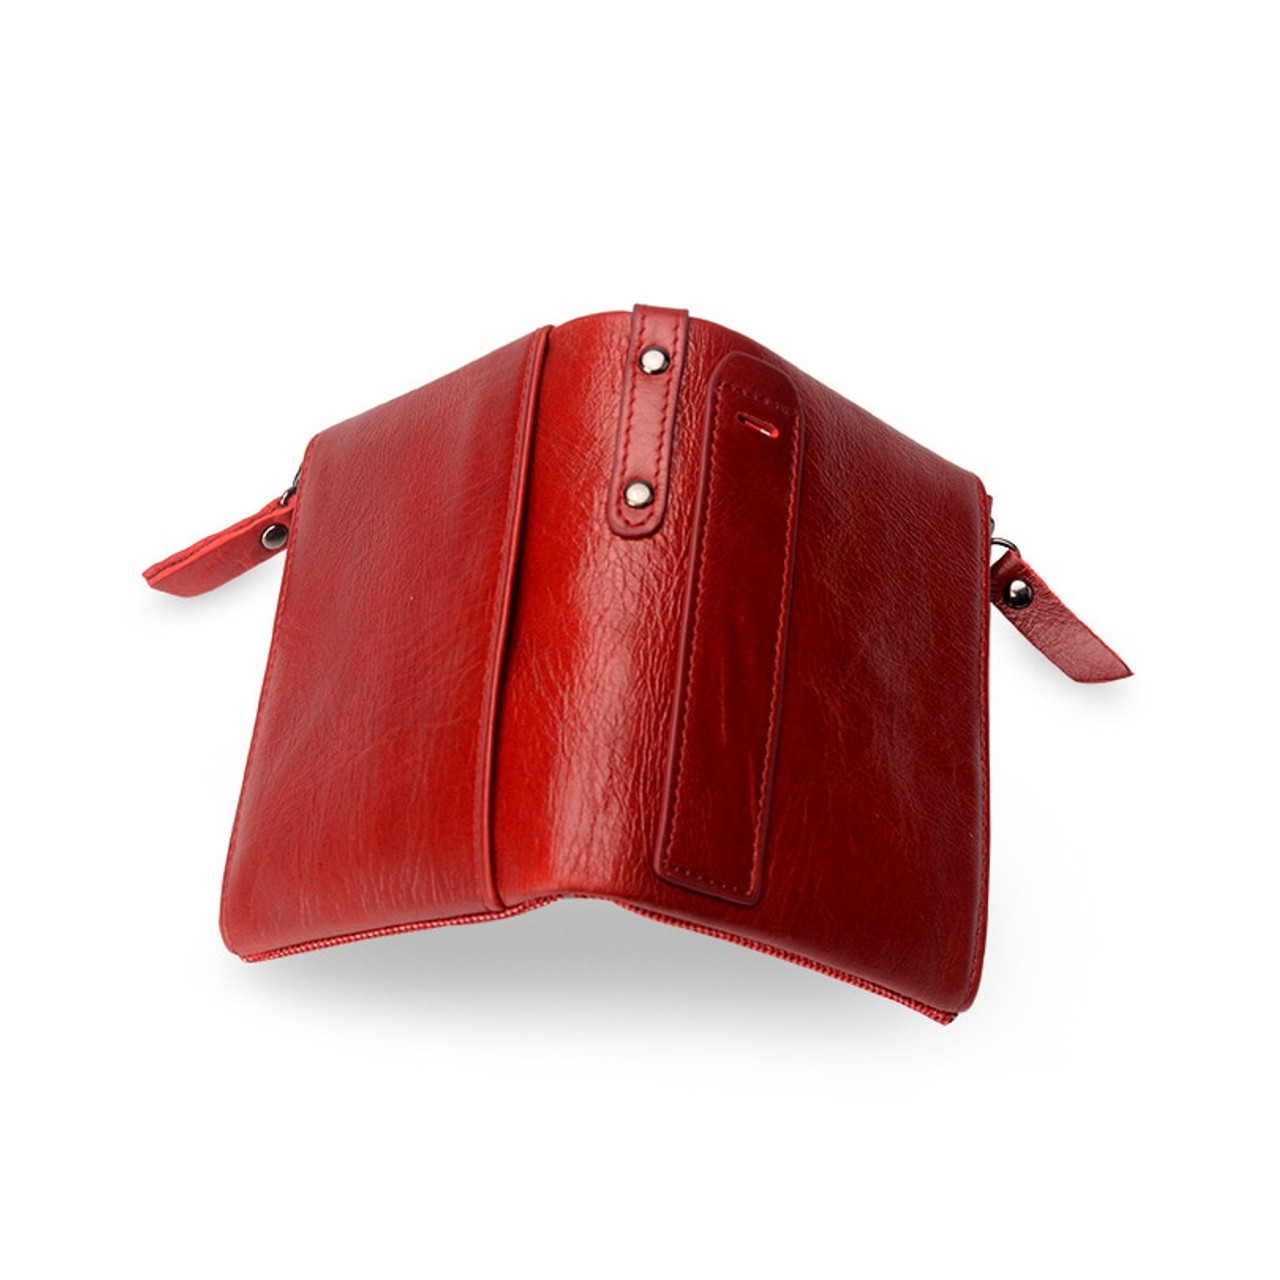 504aafa7f0 COHEART Wallet Women genuine leather top quality female wallet purse small  wallet zipper coin pocket card holders card wallet